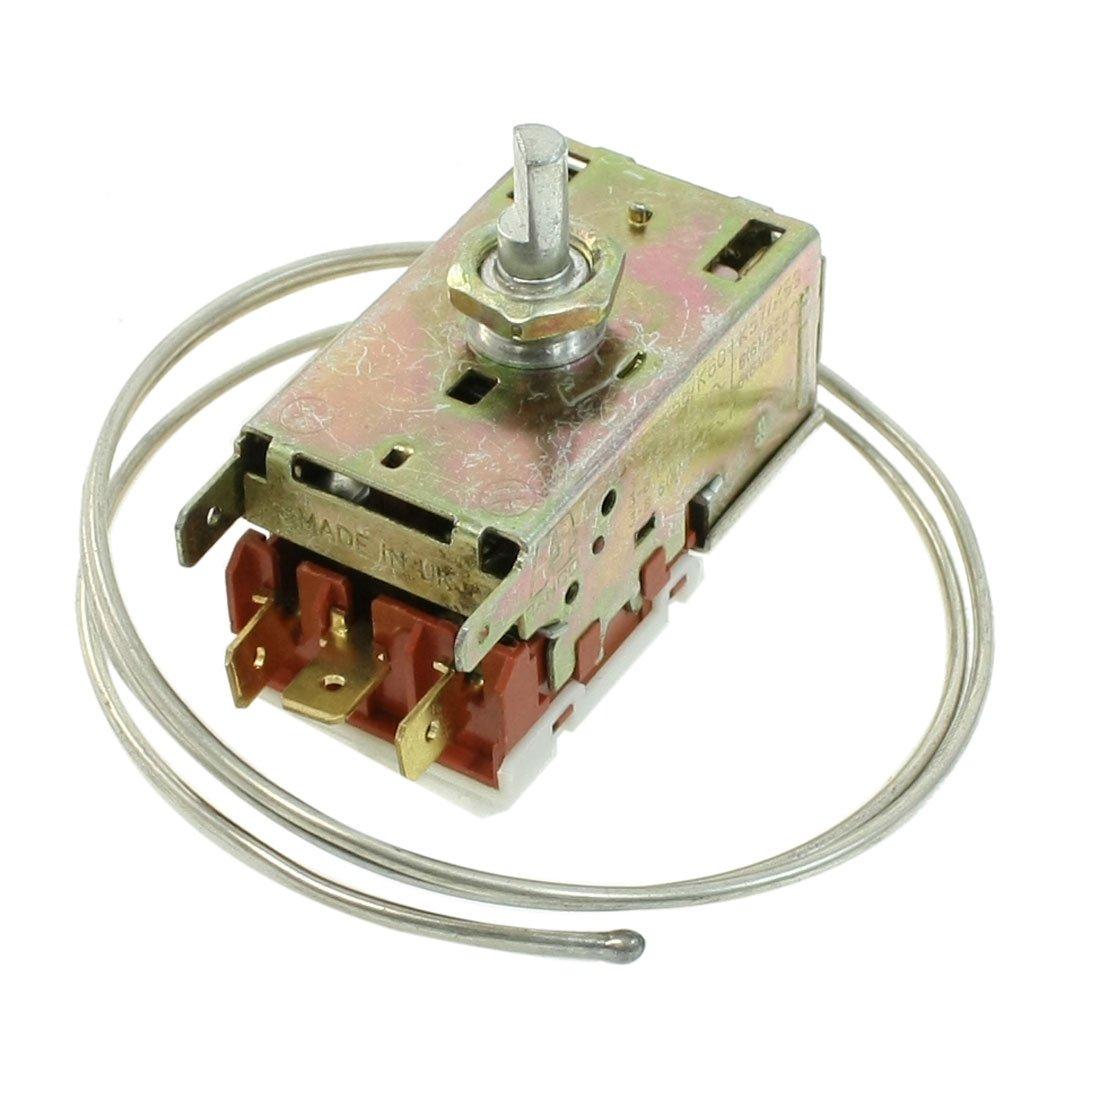 sourcingmap/® AC 250V 3A 3Pins Terminals K/ühlschrank Thermostat f/ür K/ühlschr/änke de